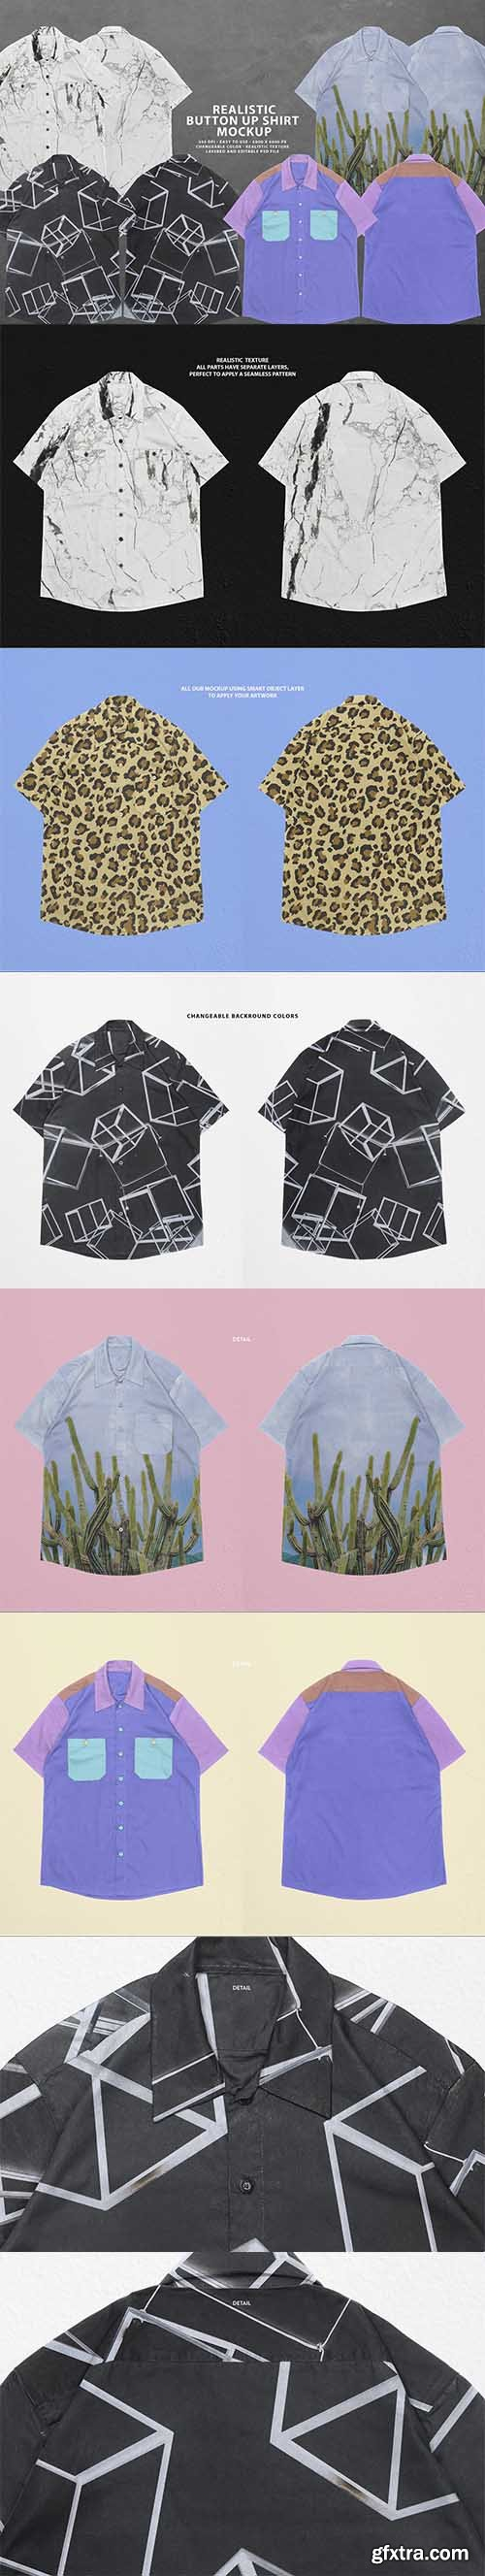 CreativeMarket - Realistic Button-Up Shirt Mockup 5931439